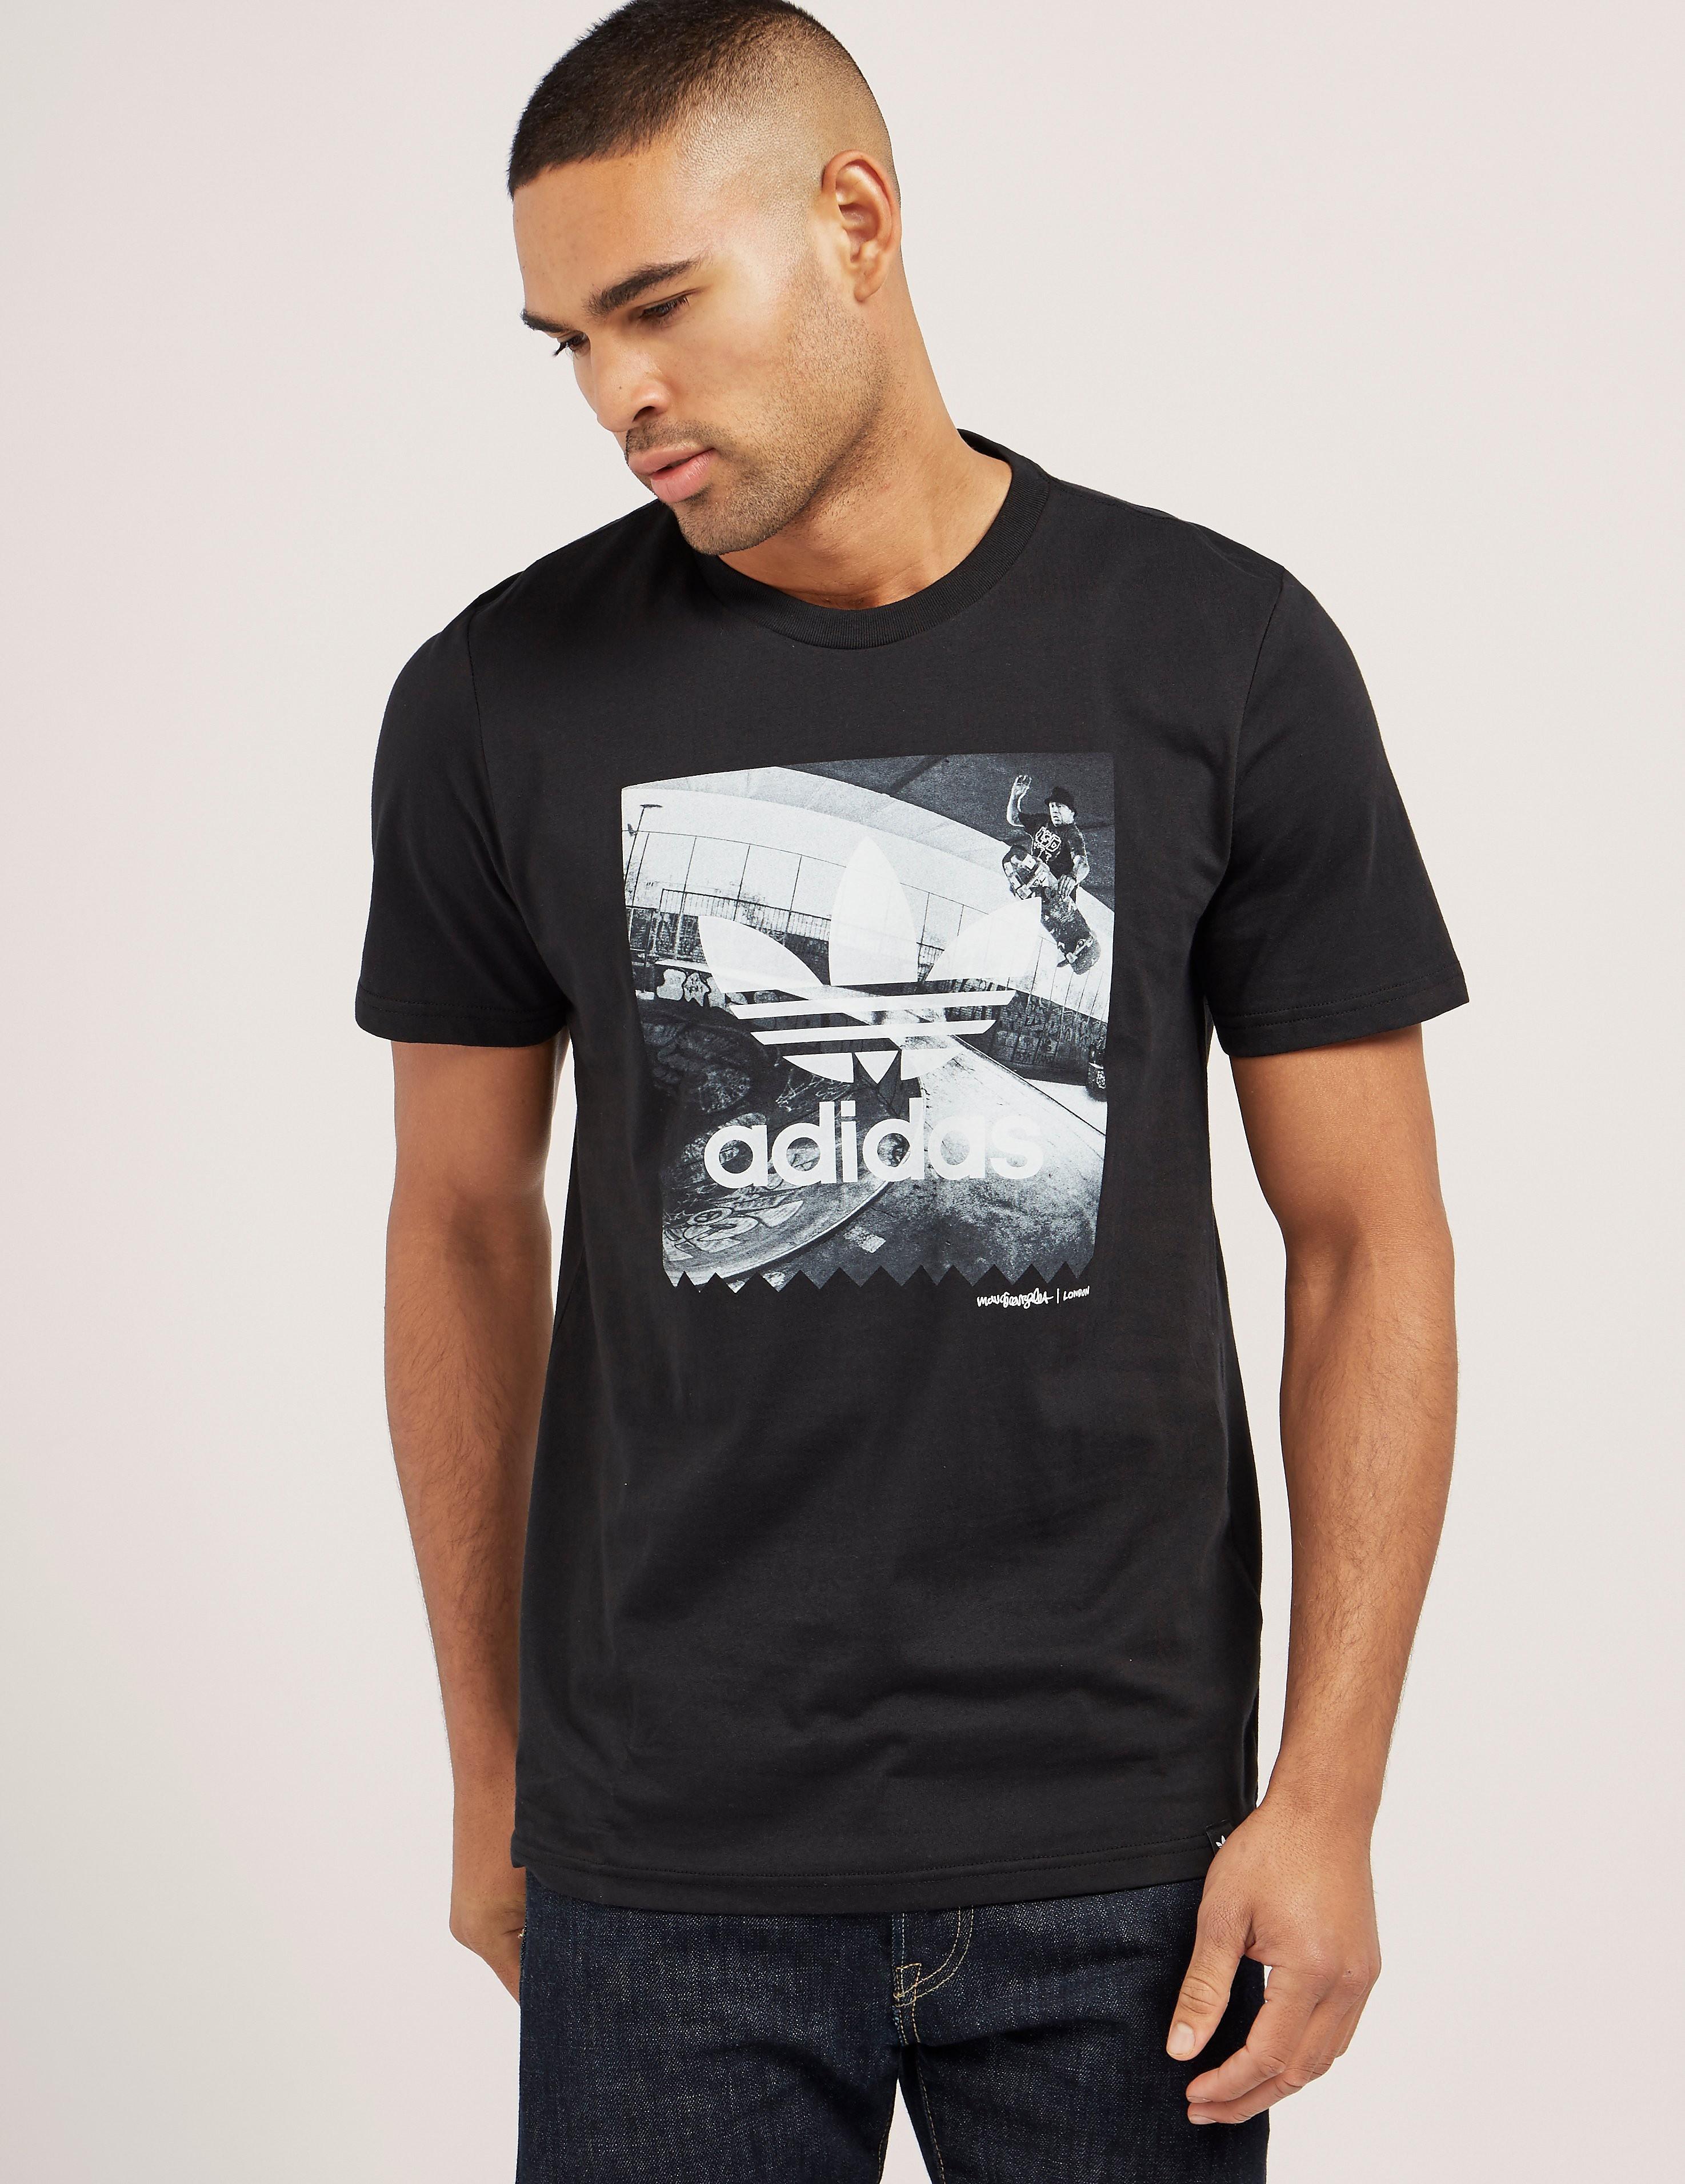 adidas Originals London Photo Short Sleeve T-Shirt